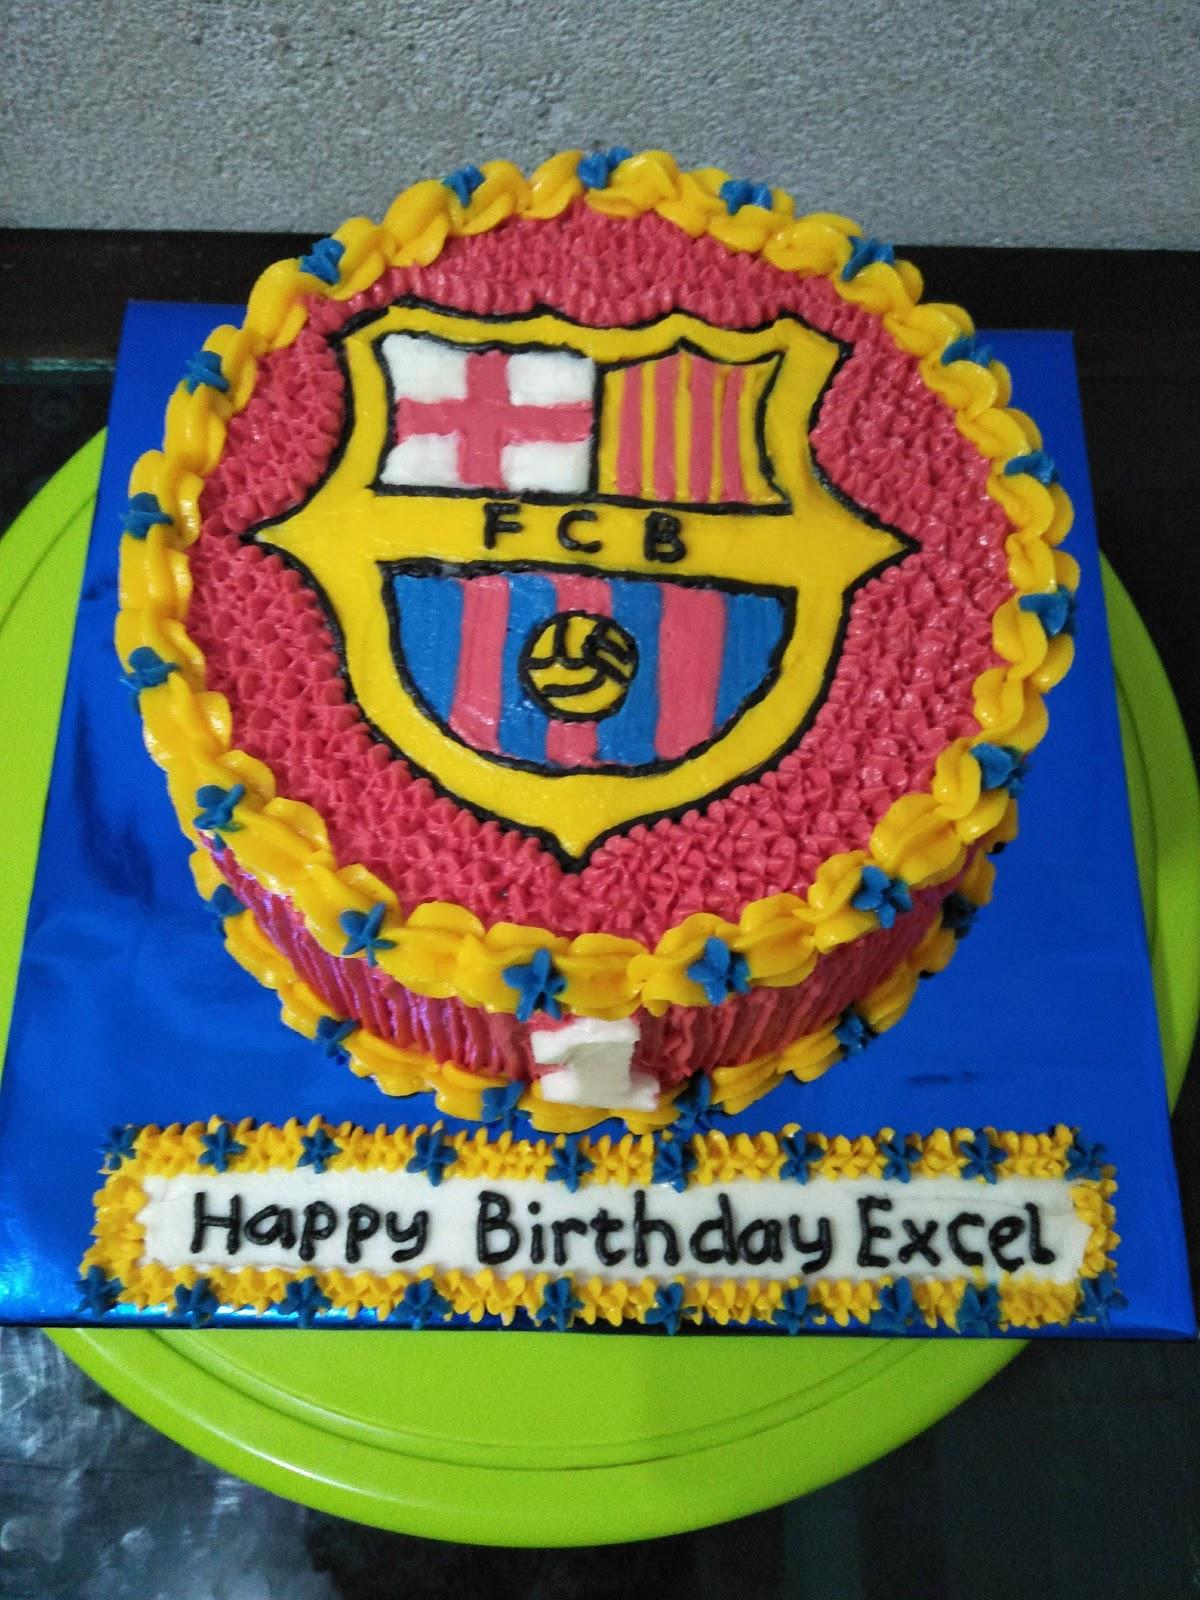 Kue Enak Jayapura Kue Ultah Fc Barcelona